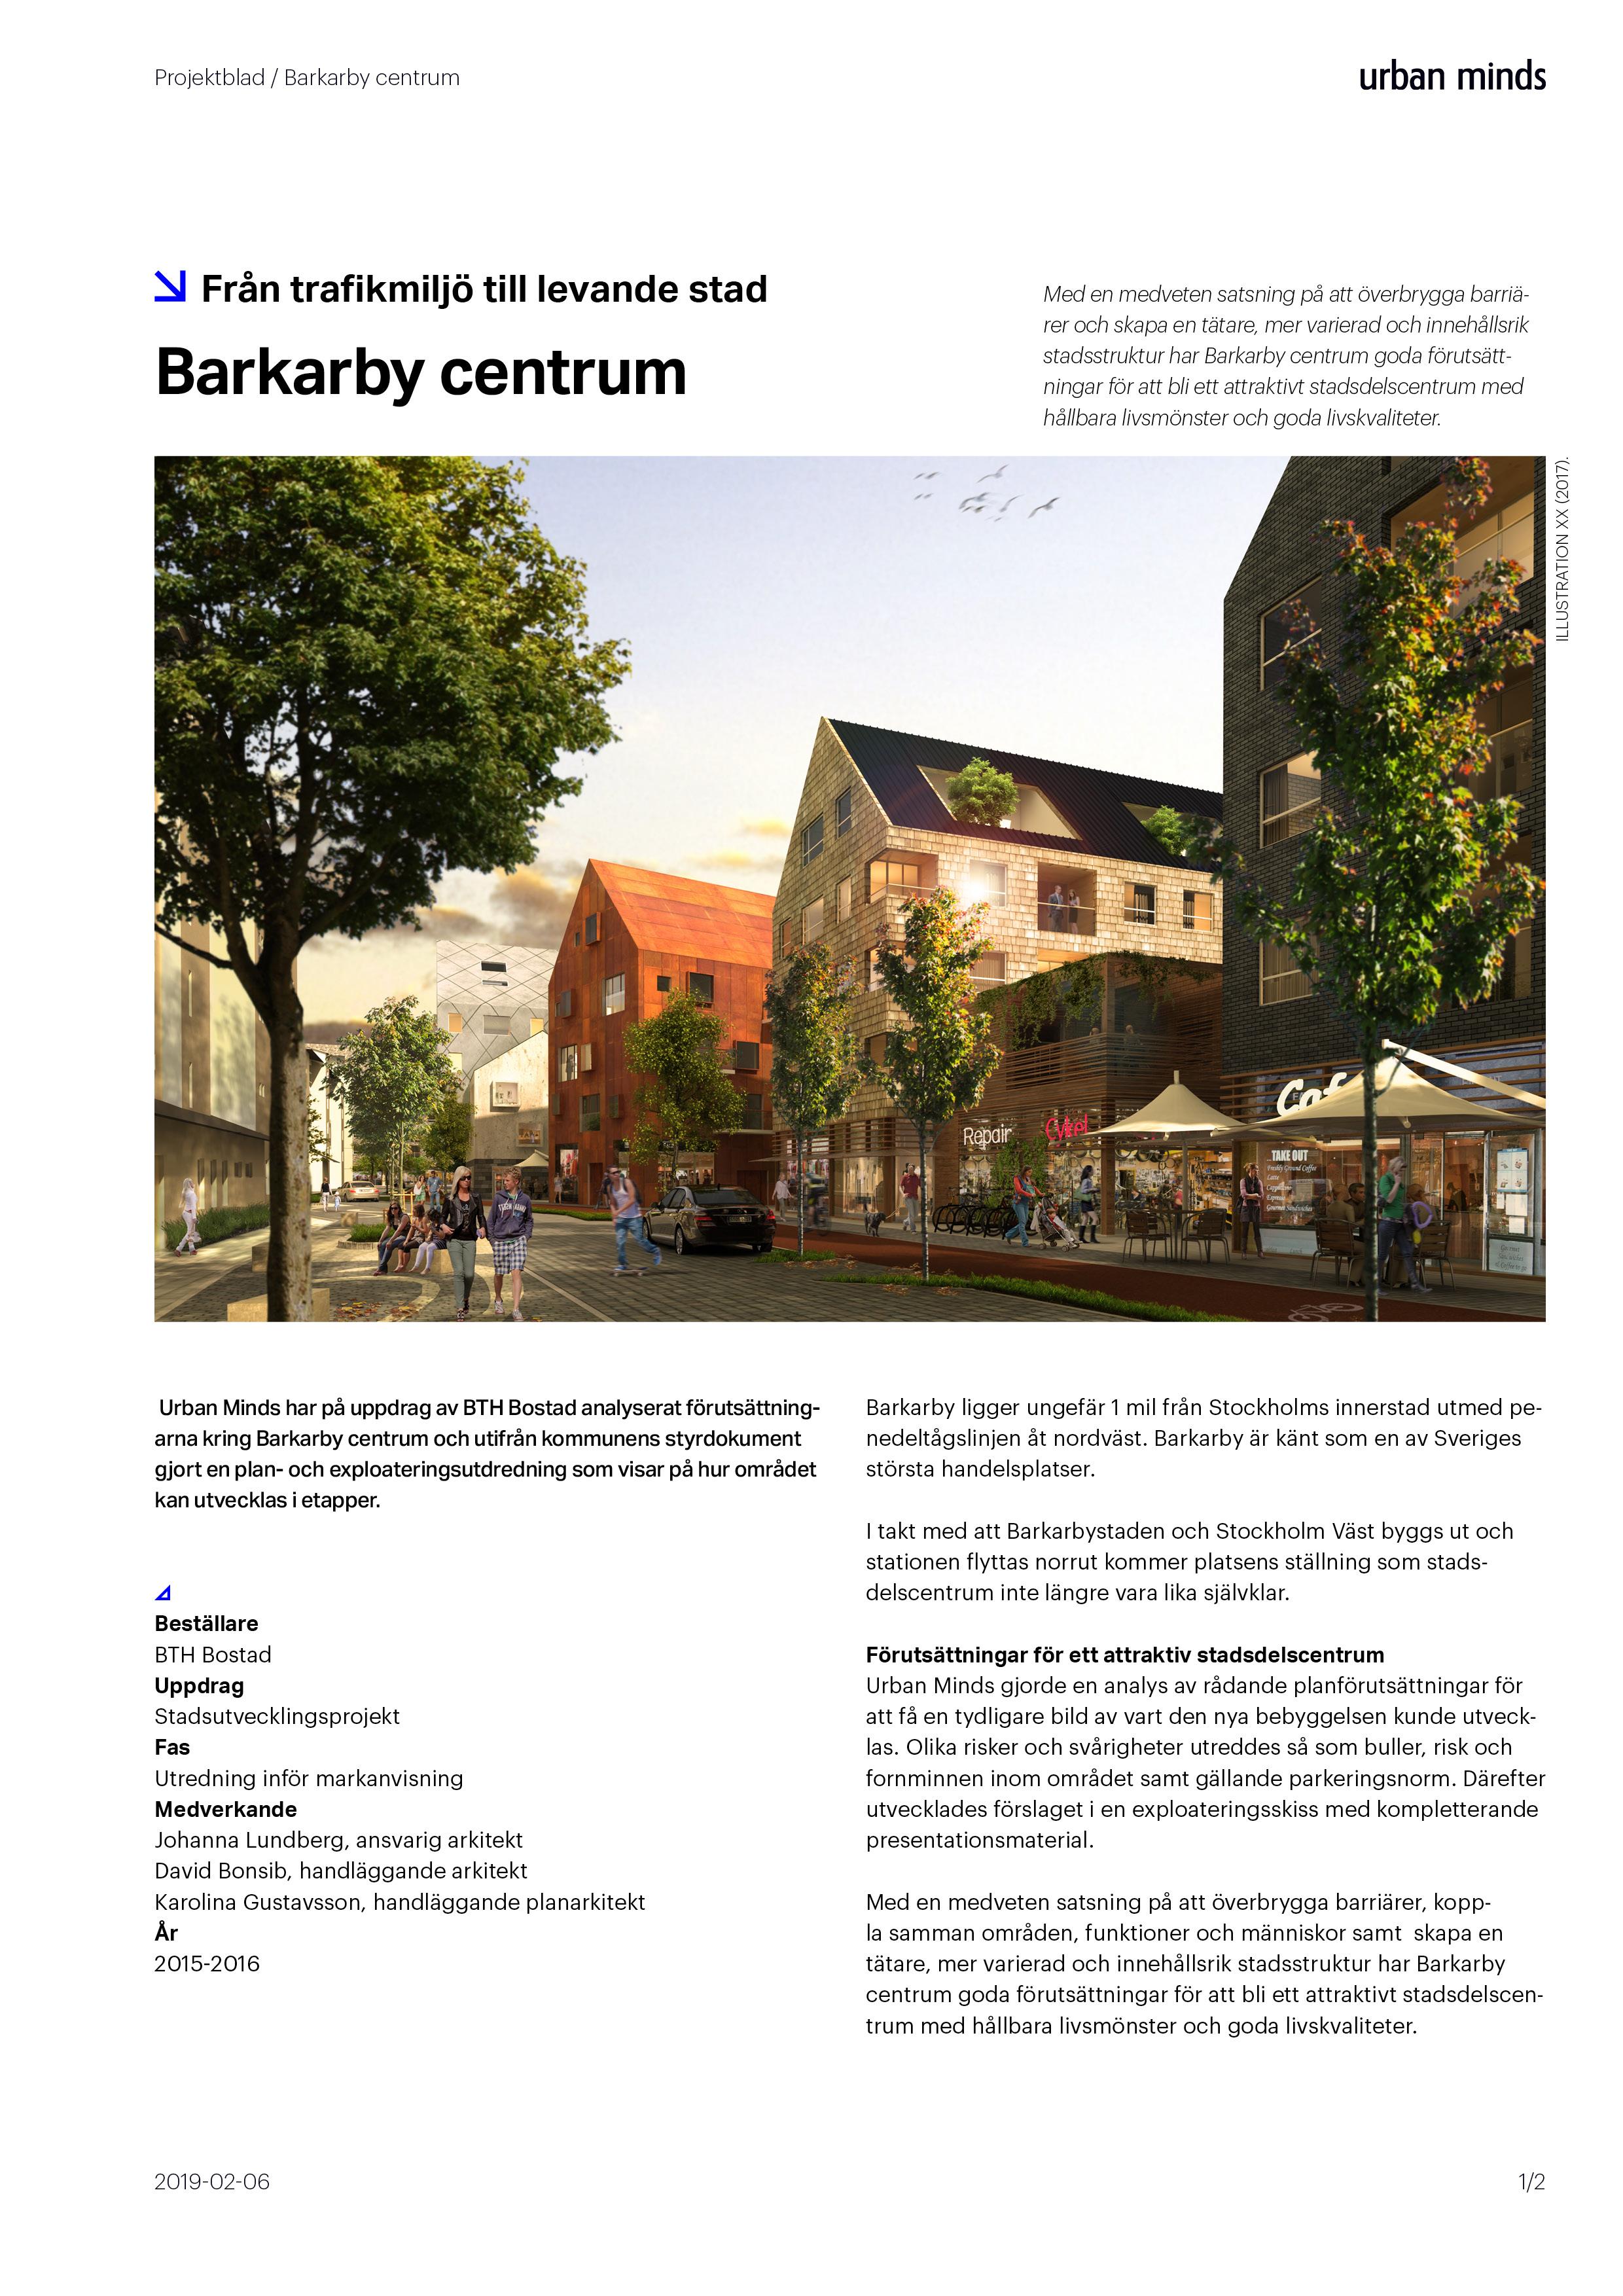 UM_Barkarby_A4.jpg